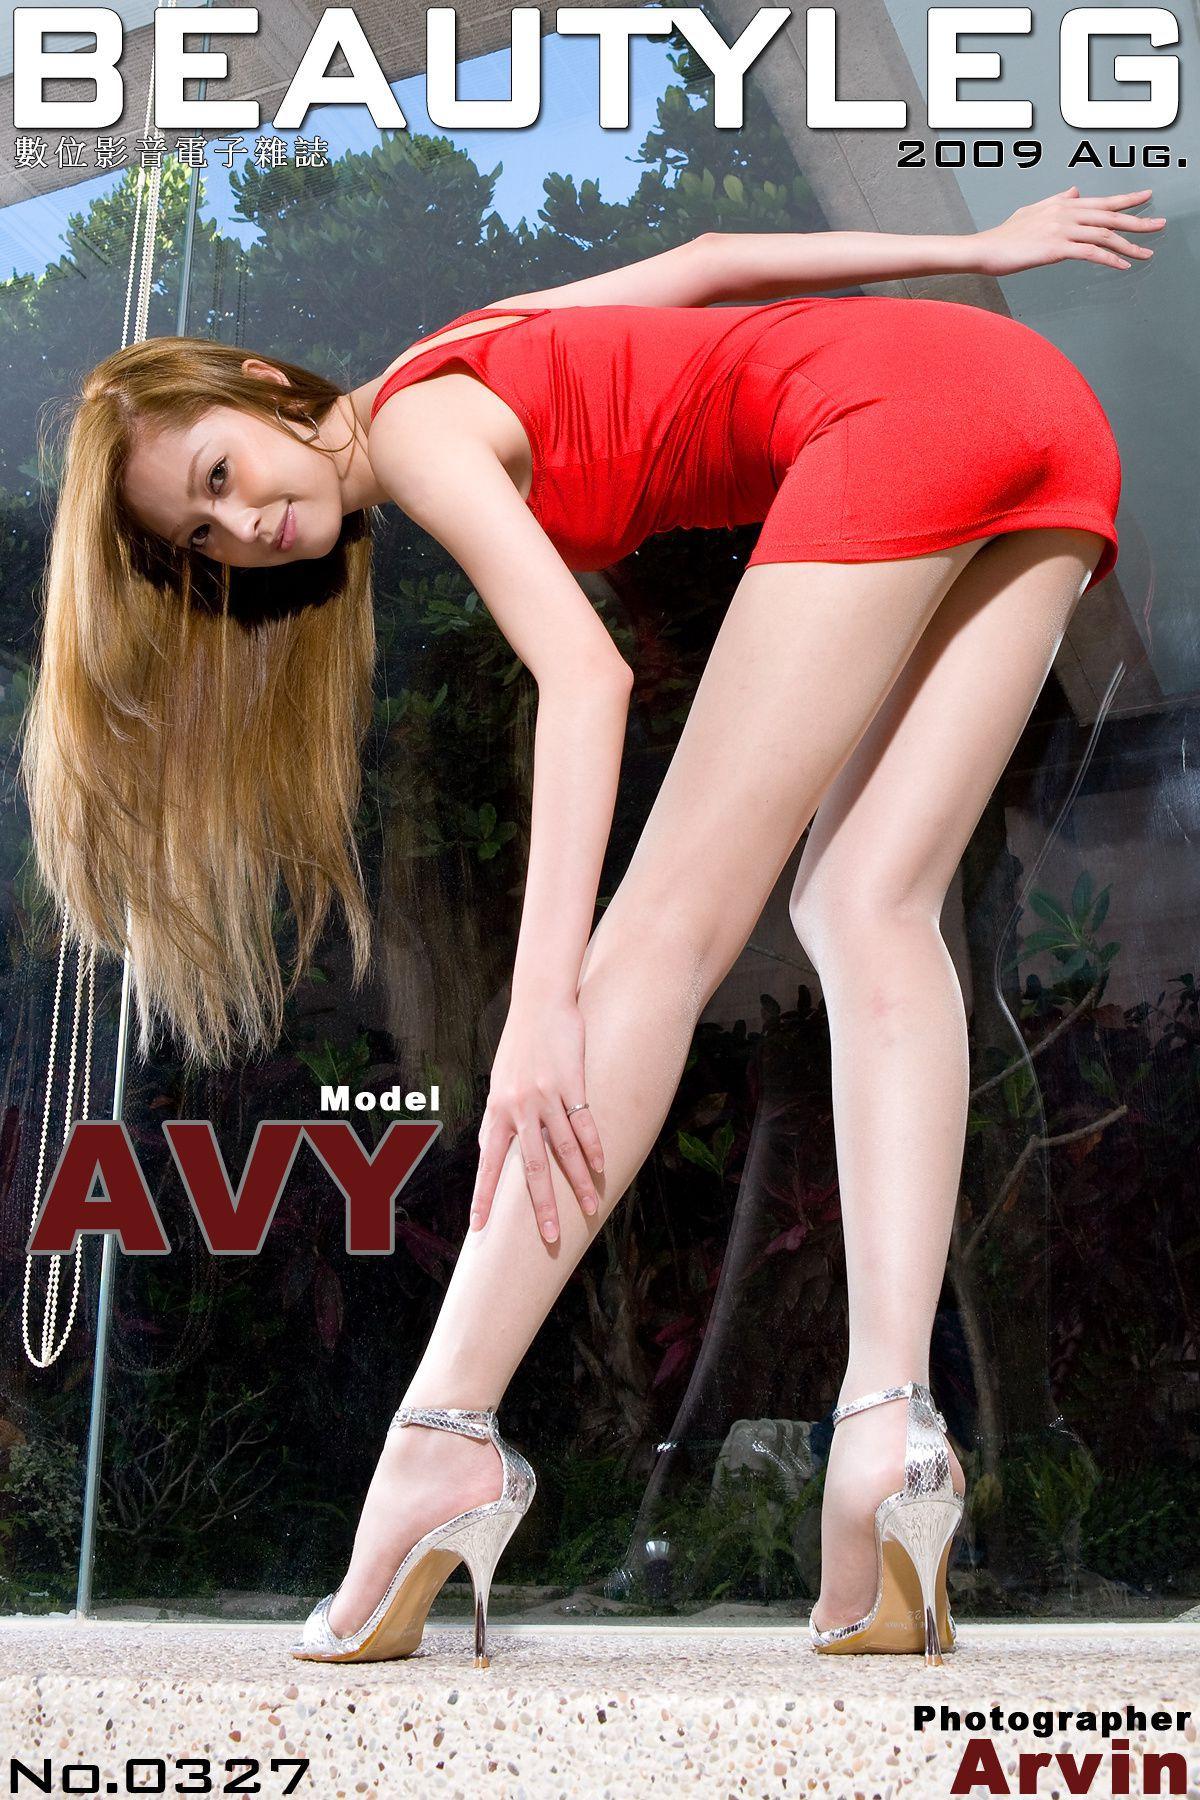 Thumbnail of post image 092